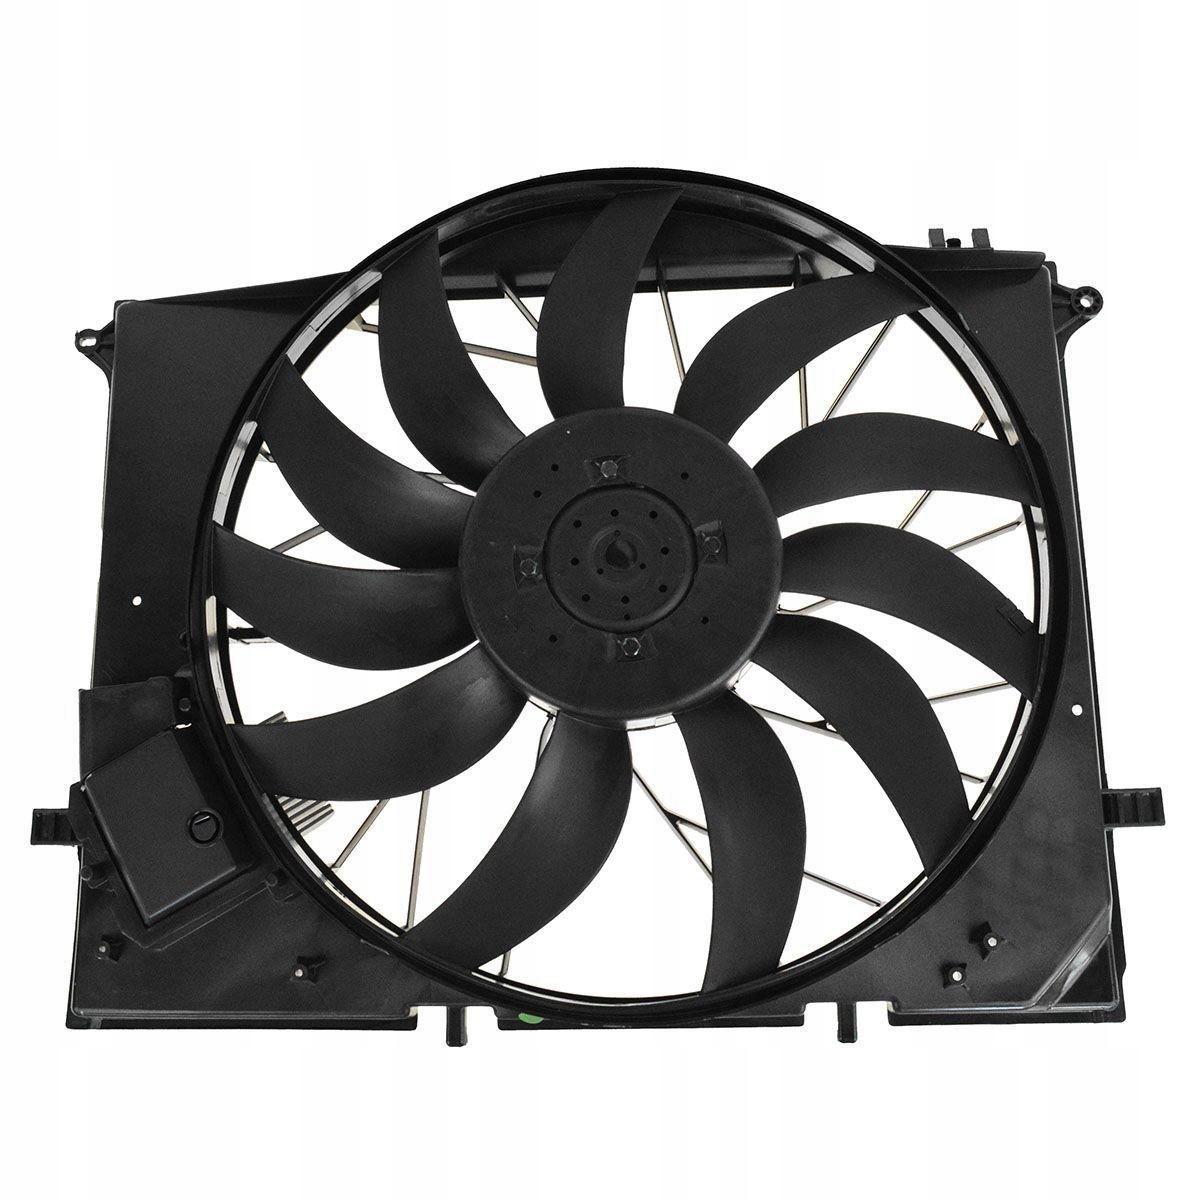 mercedes w220 s-class вентилятор a2205000193 650w